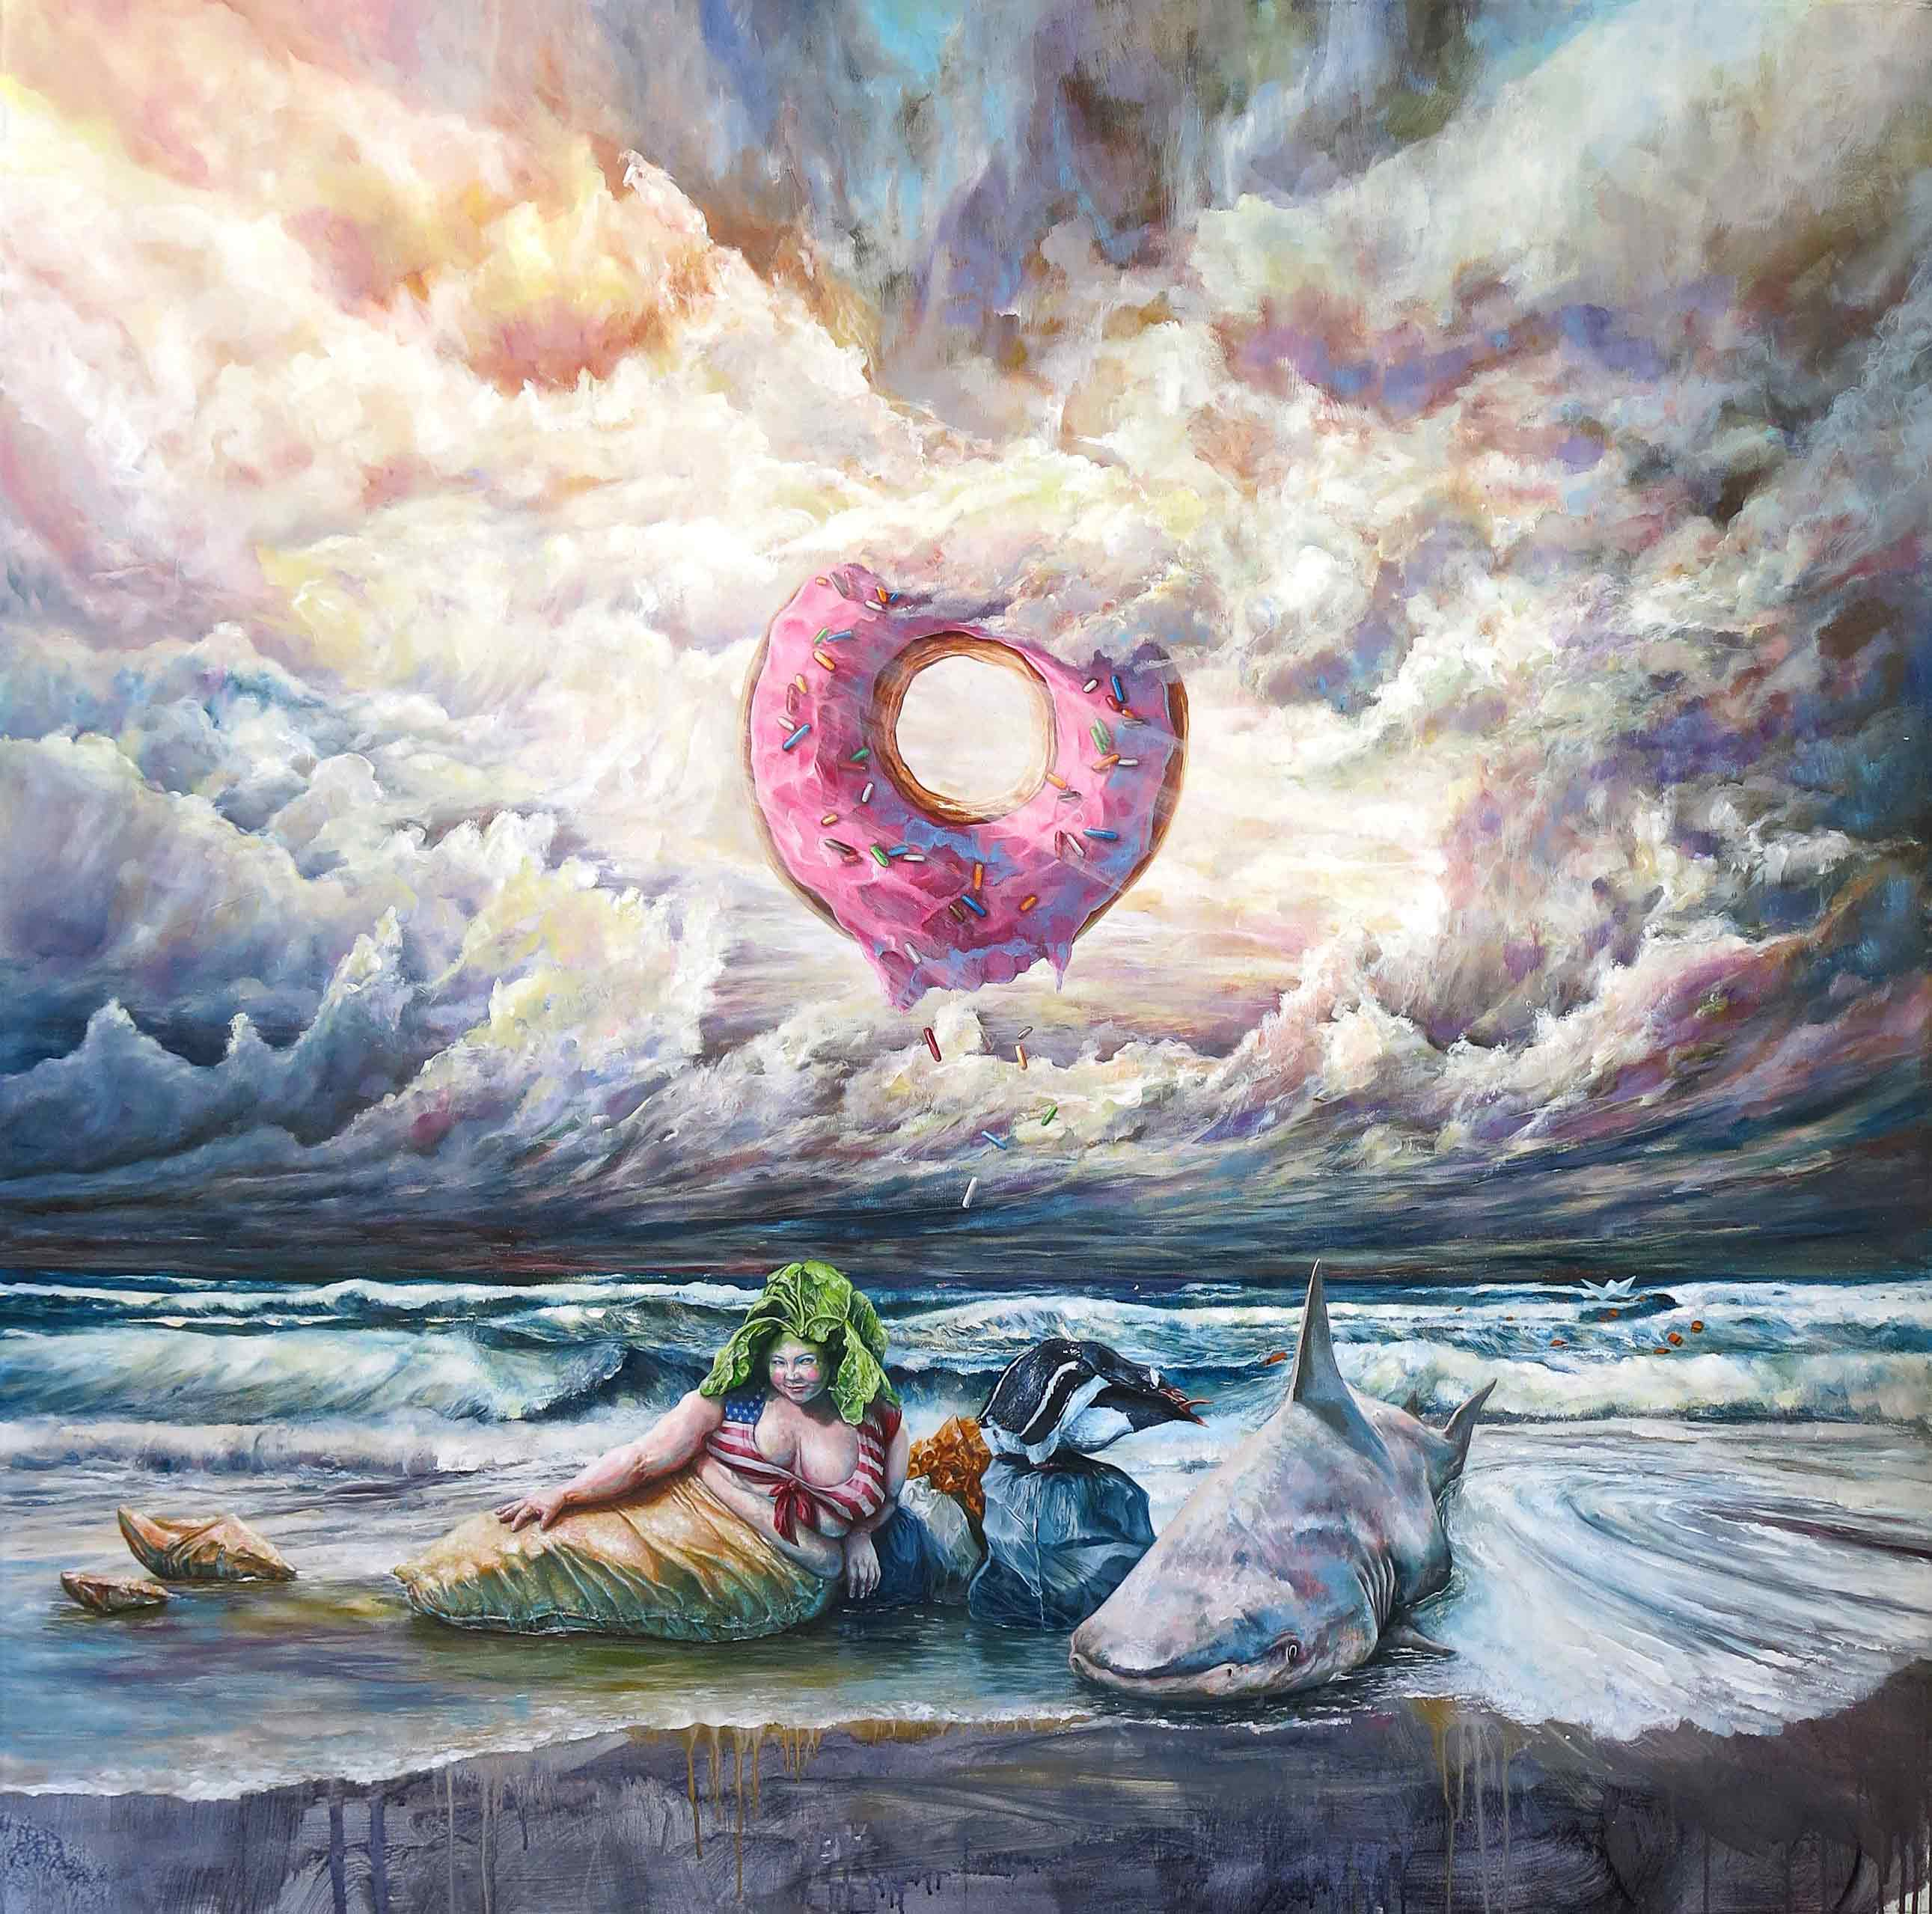 JONATHAN OUISSE - Magic mermaid